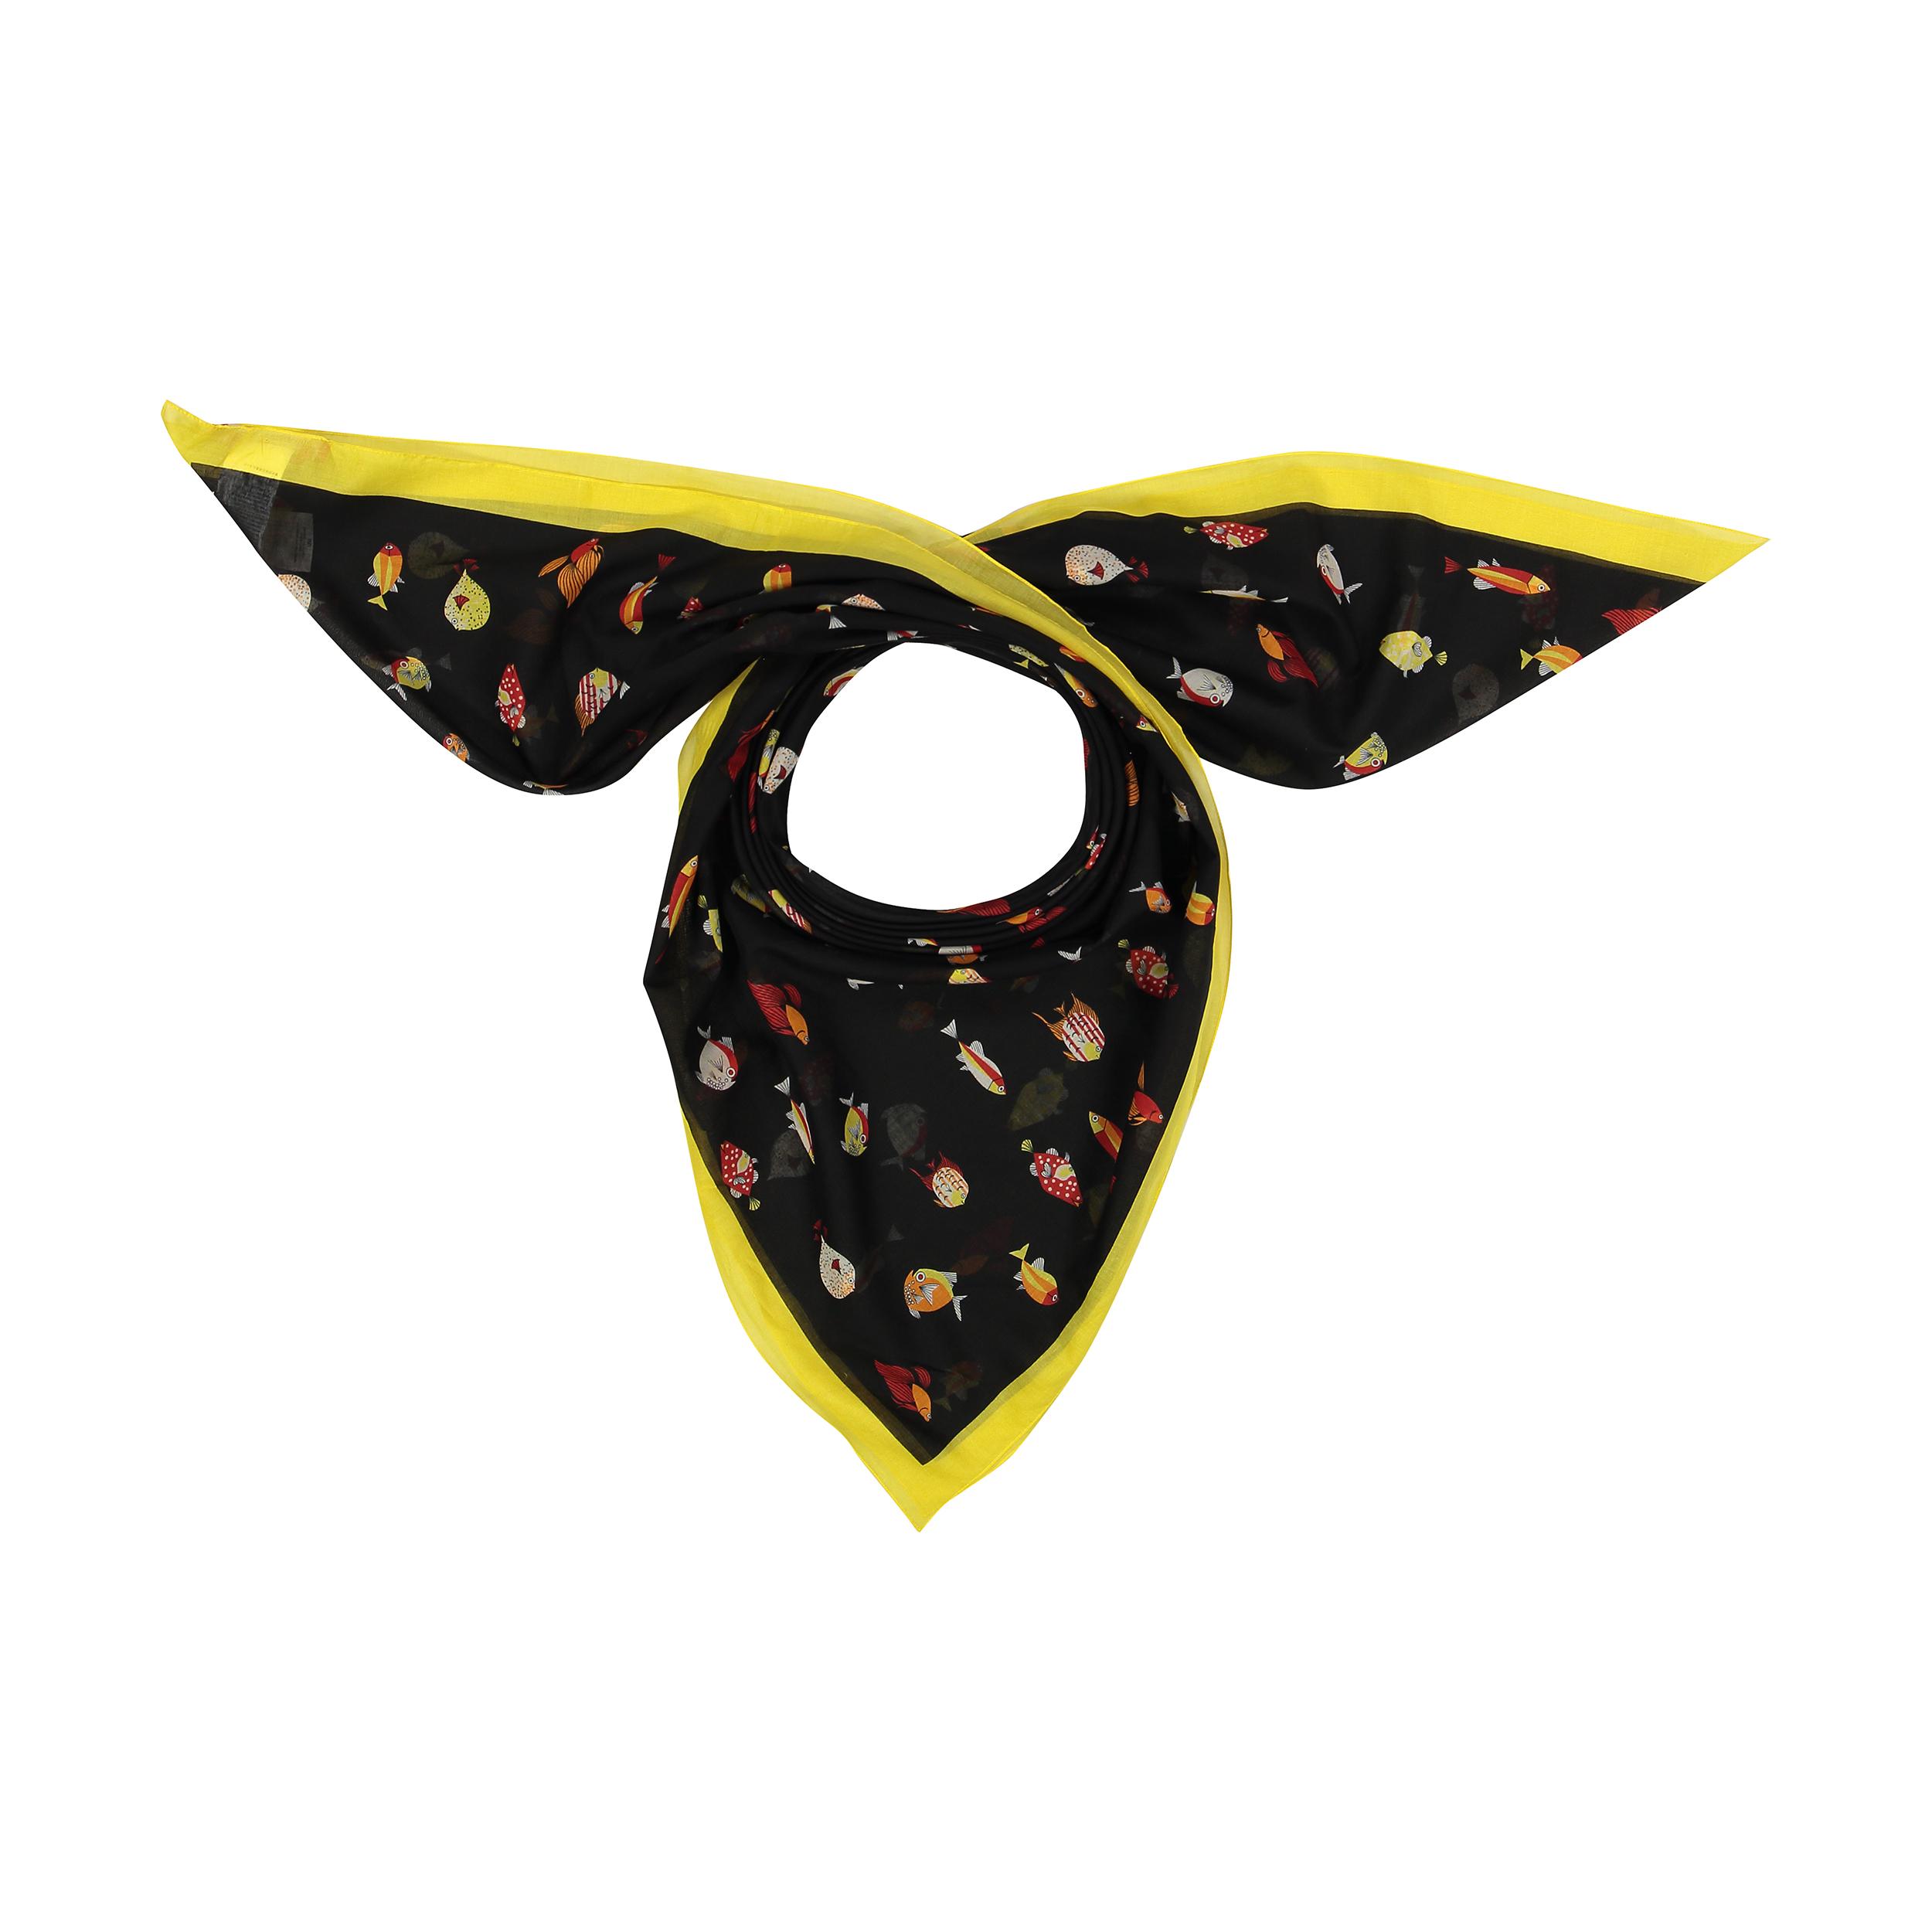 روسری زنانه مارینا رینالدی مدل 55410180040032